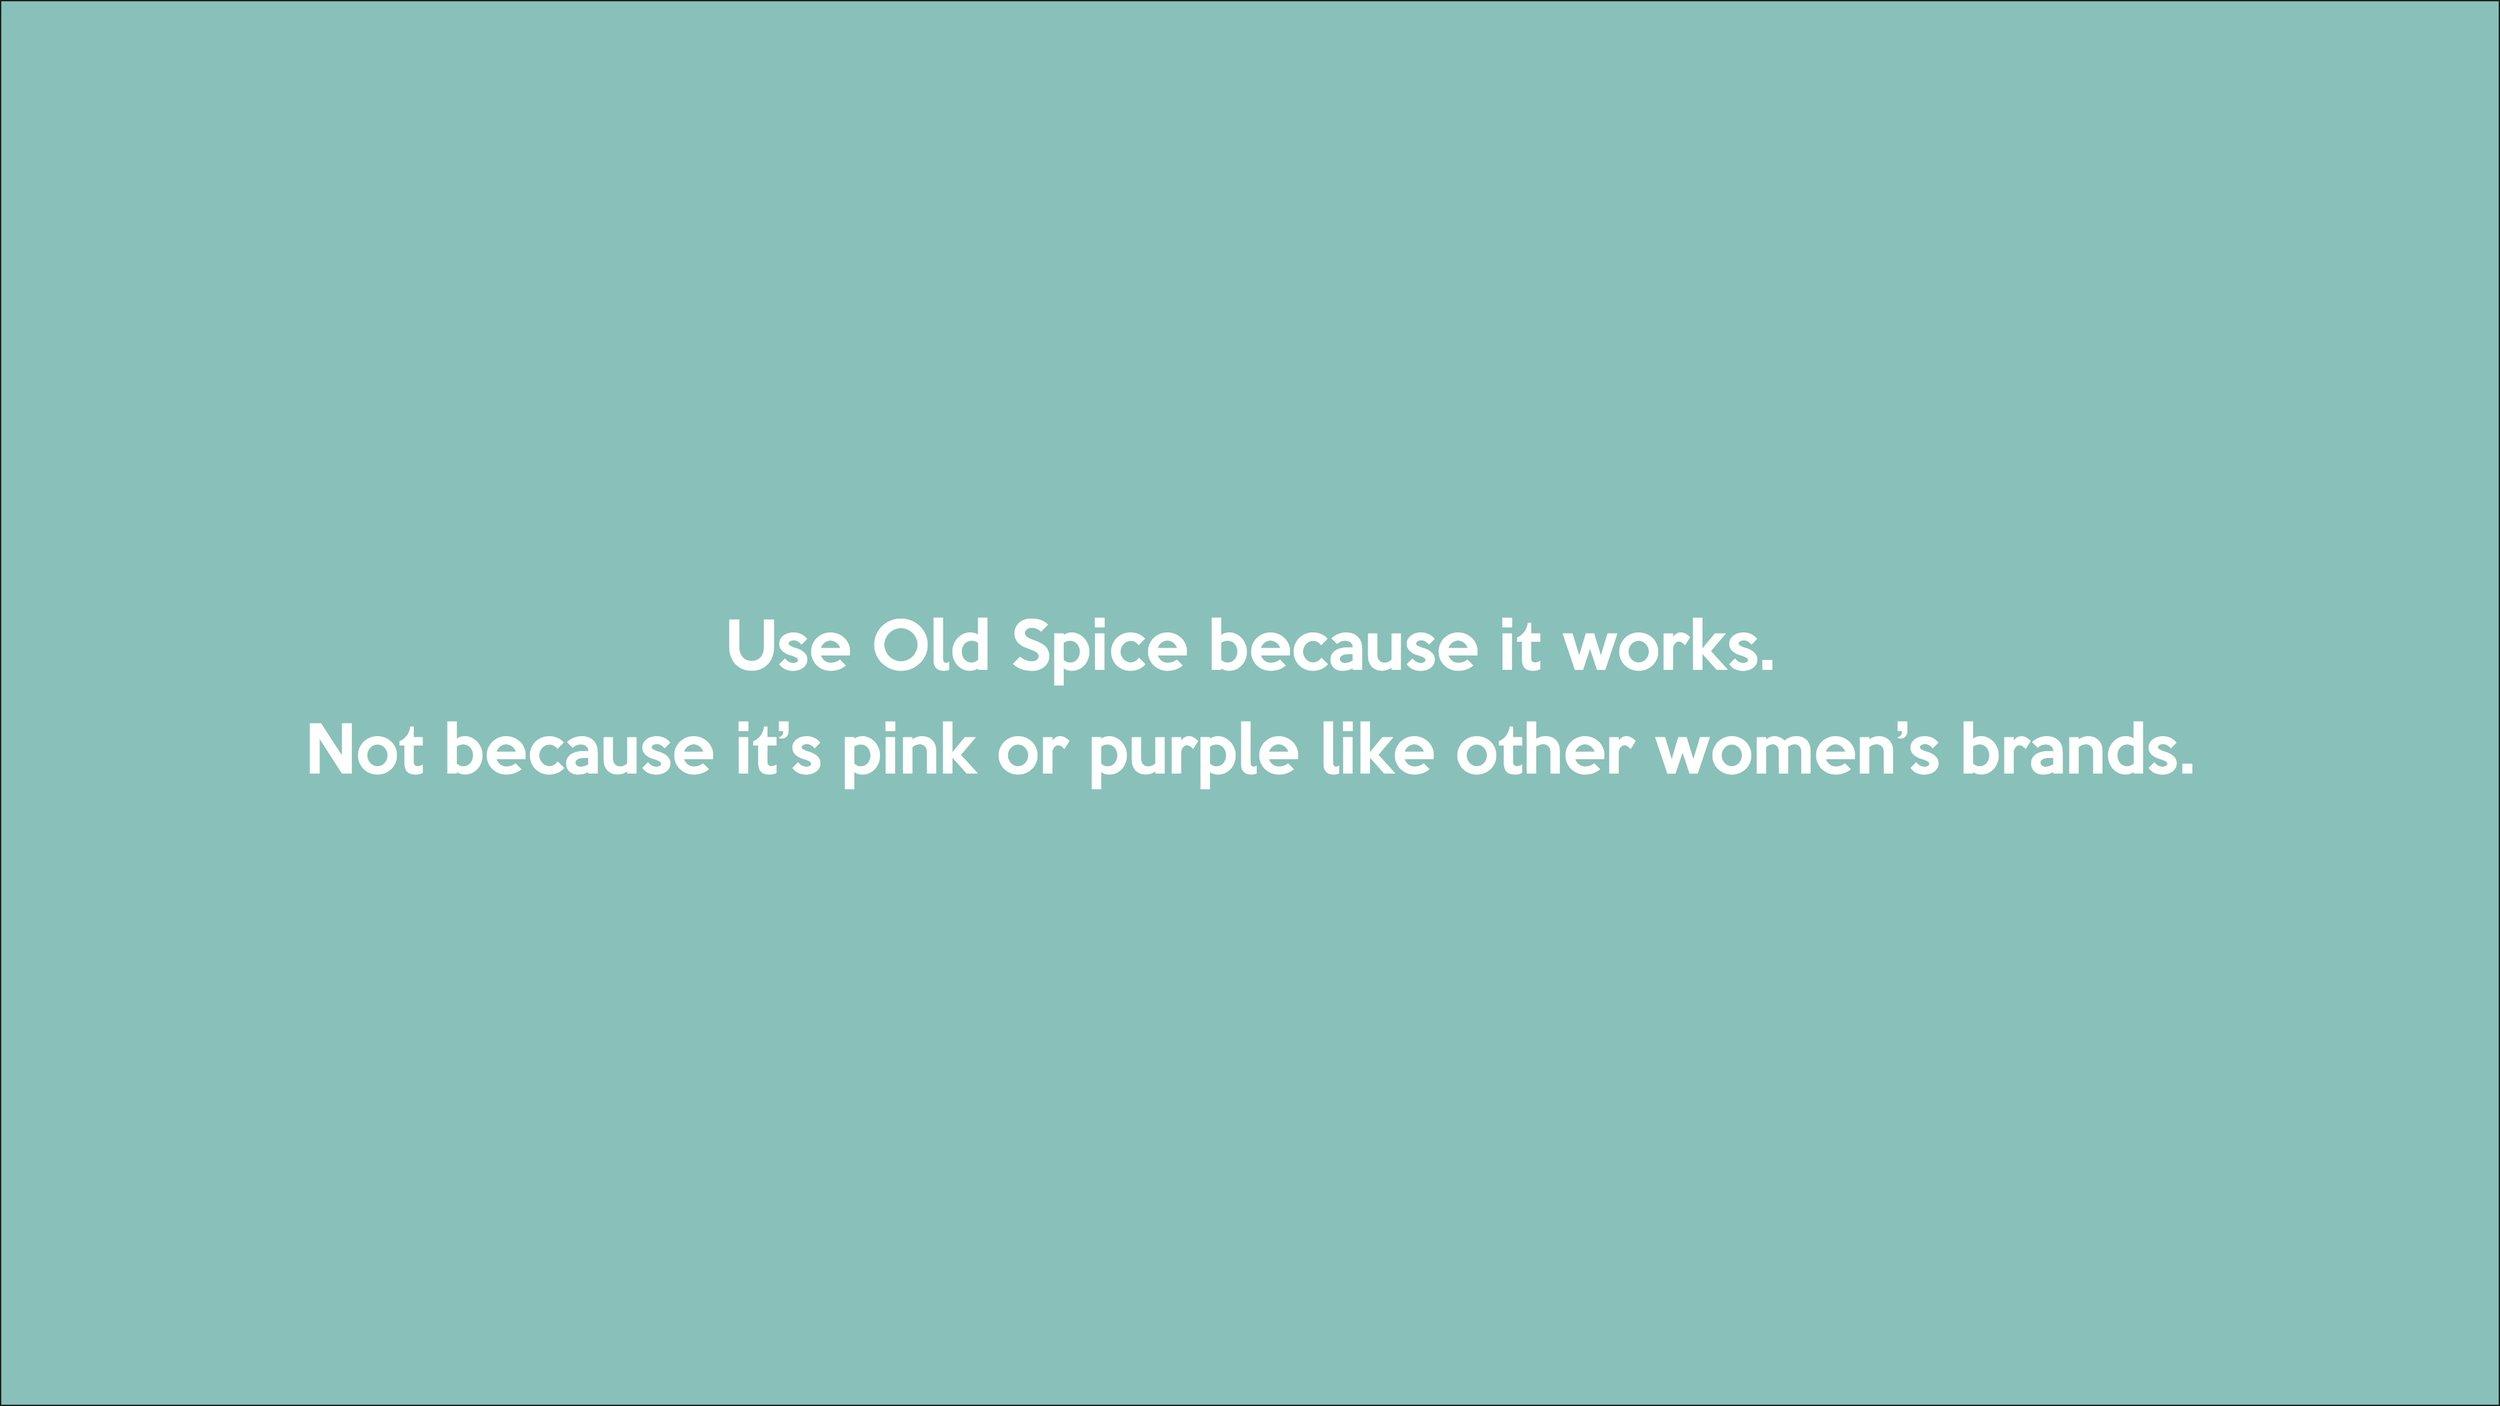 Old-Spice-Video-Frame-12.jpeg